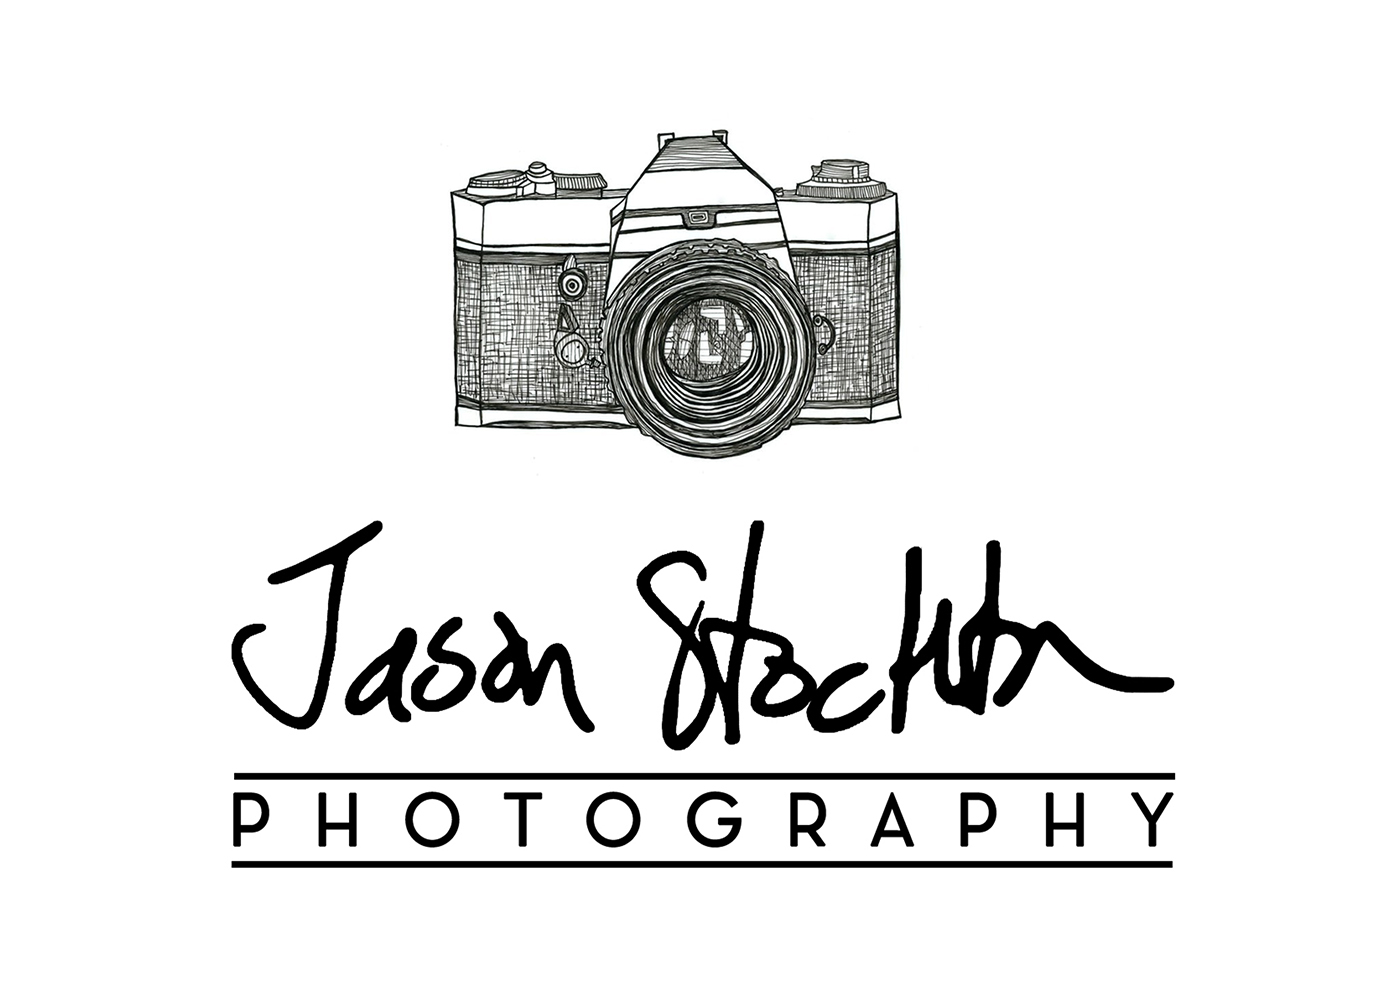 Jason Stockton Photography floor plan in Sobieski